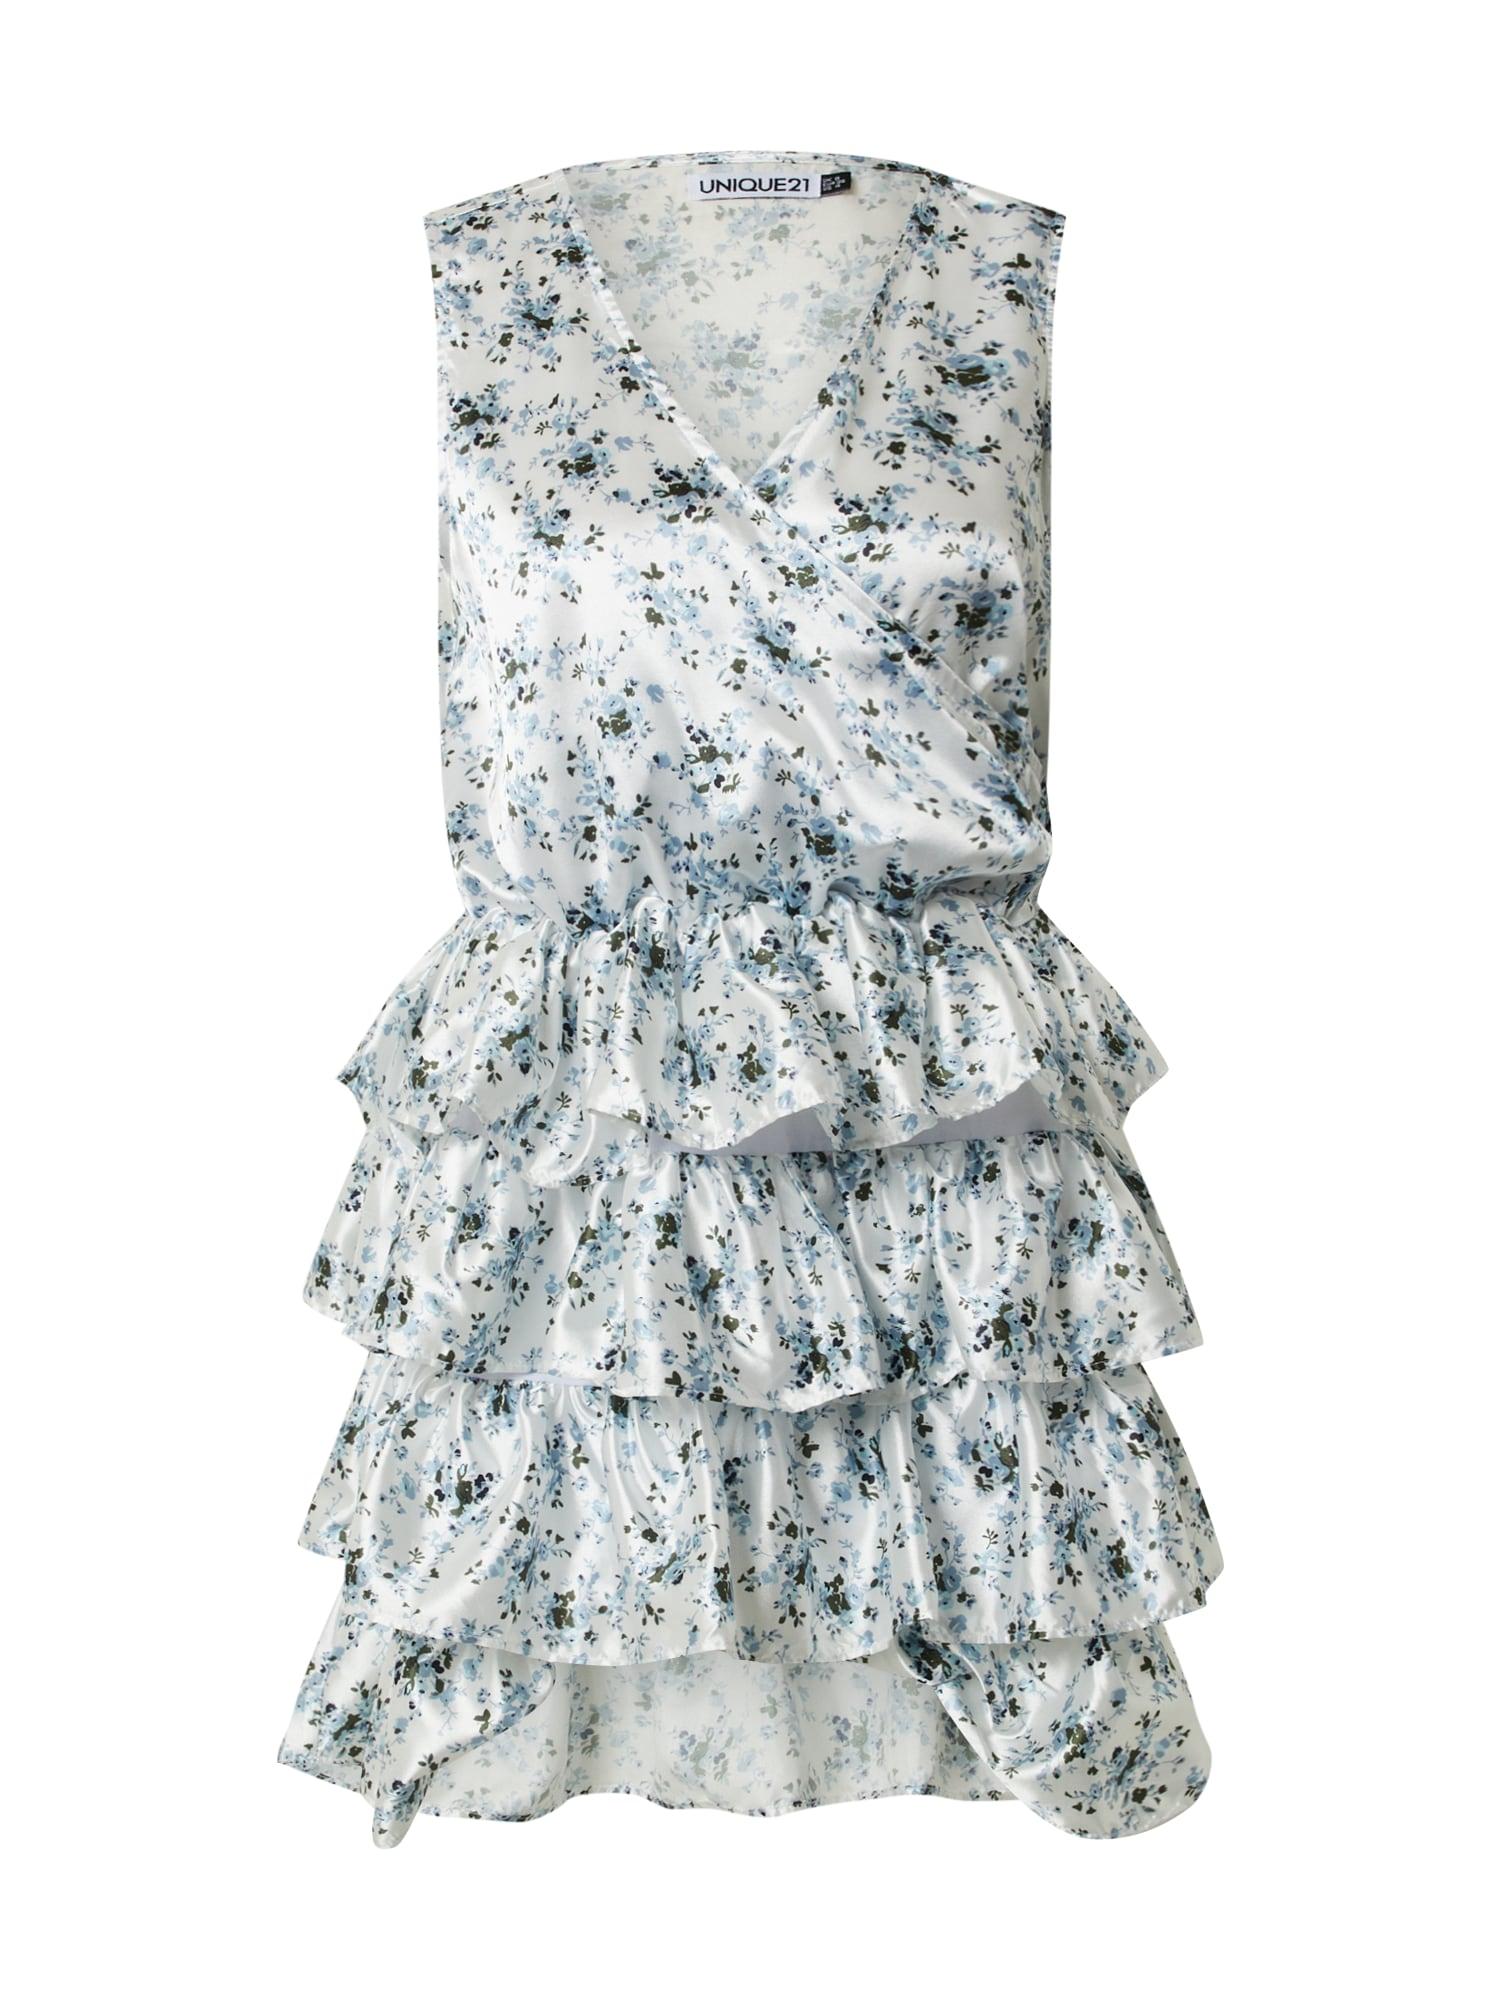 Unique21 Suknelė balta